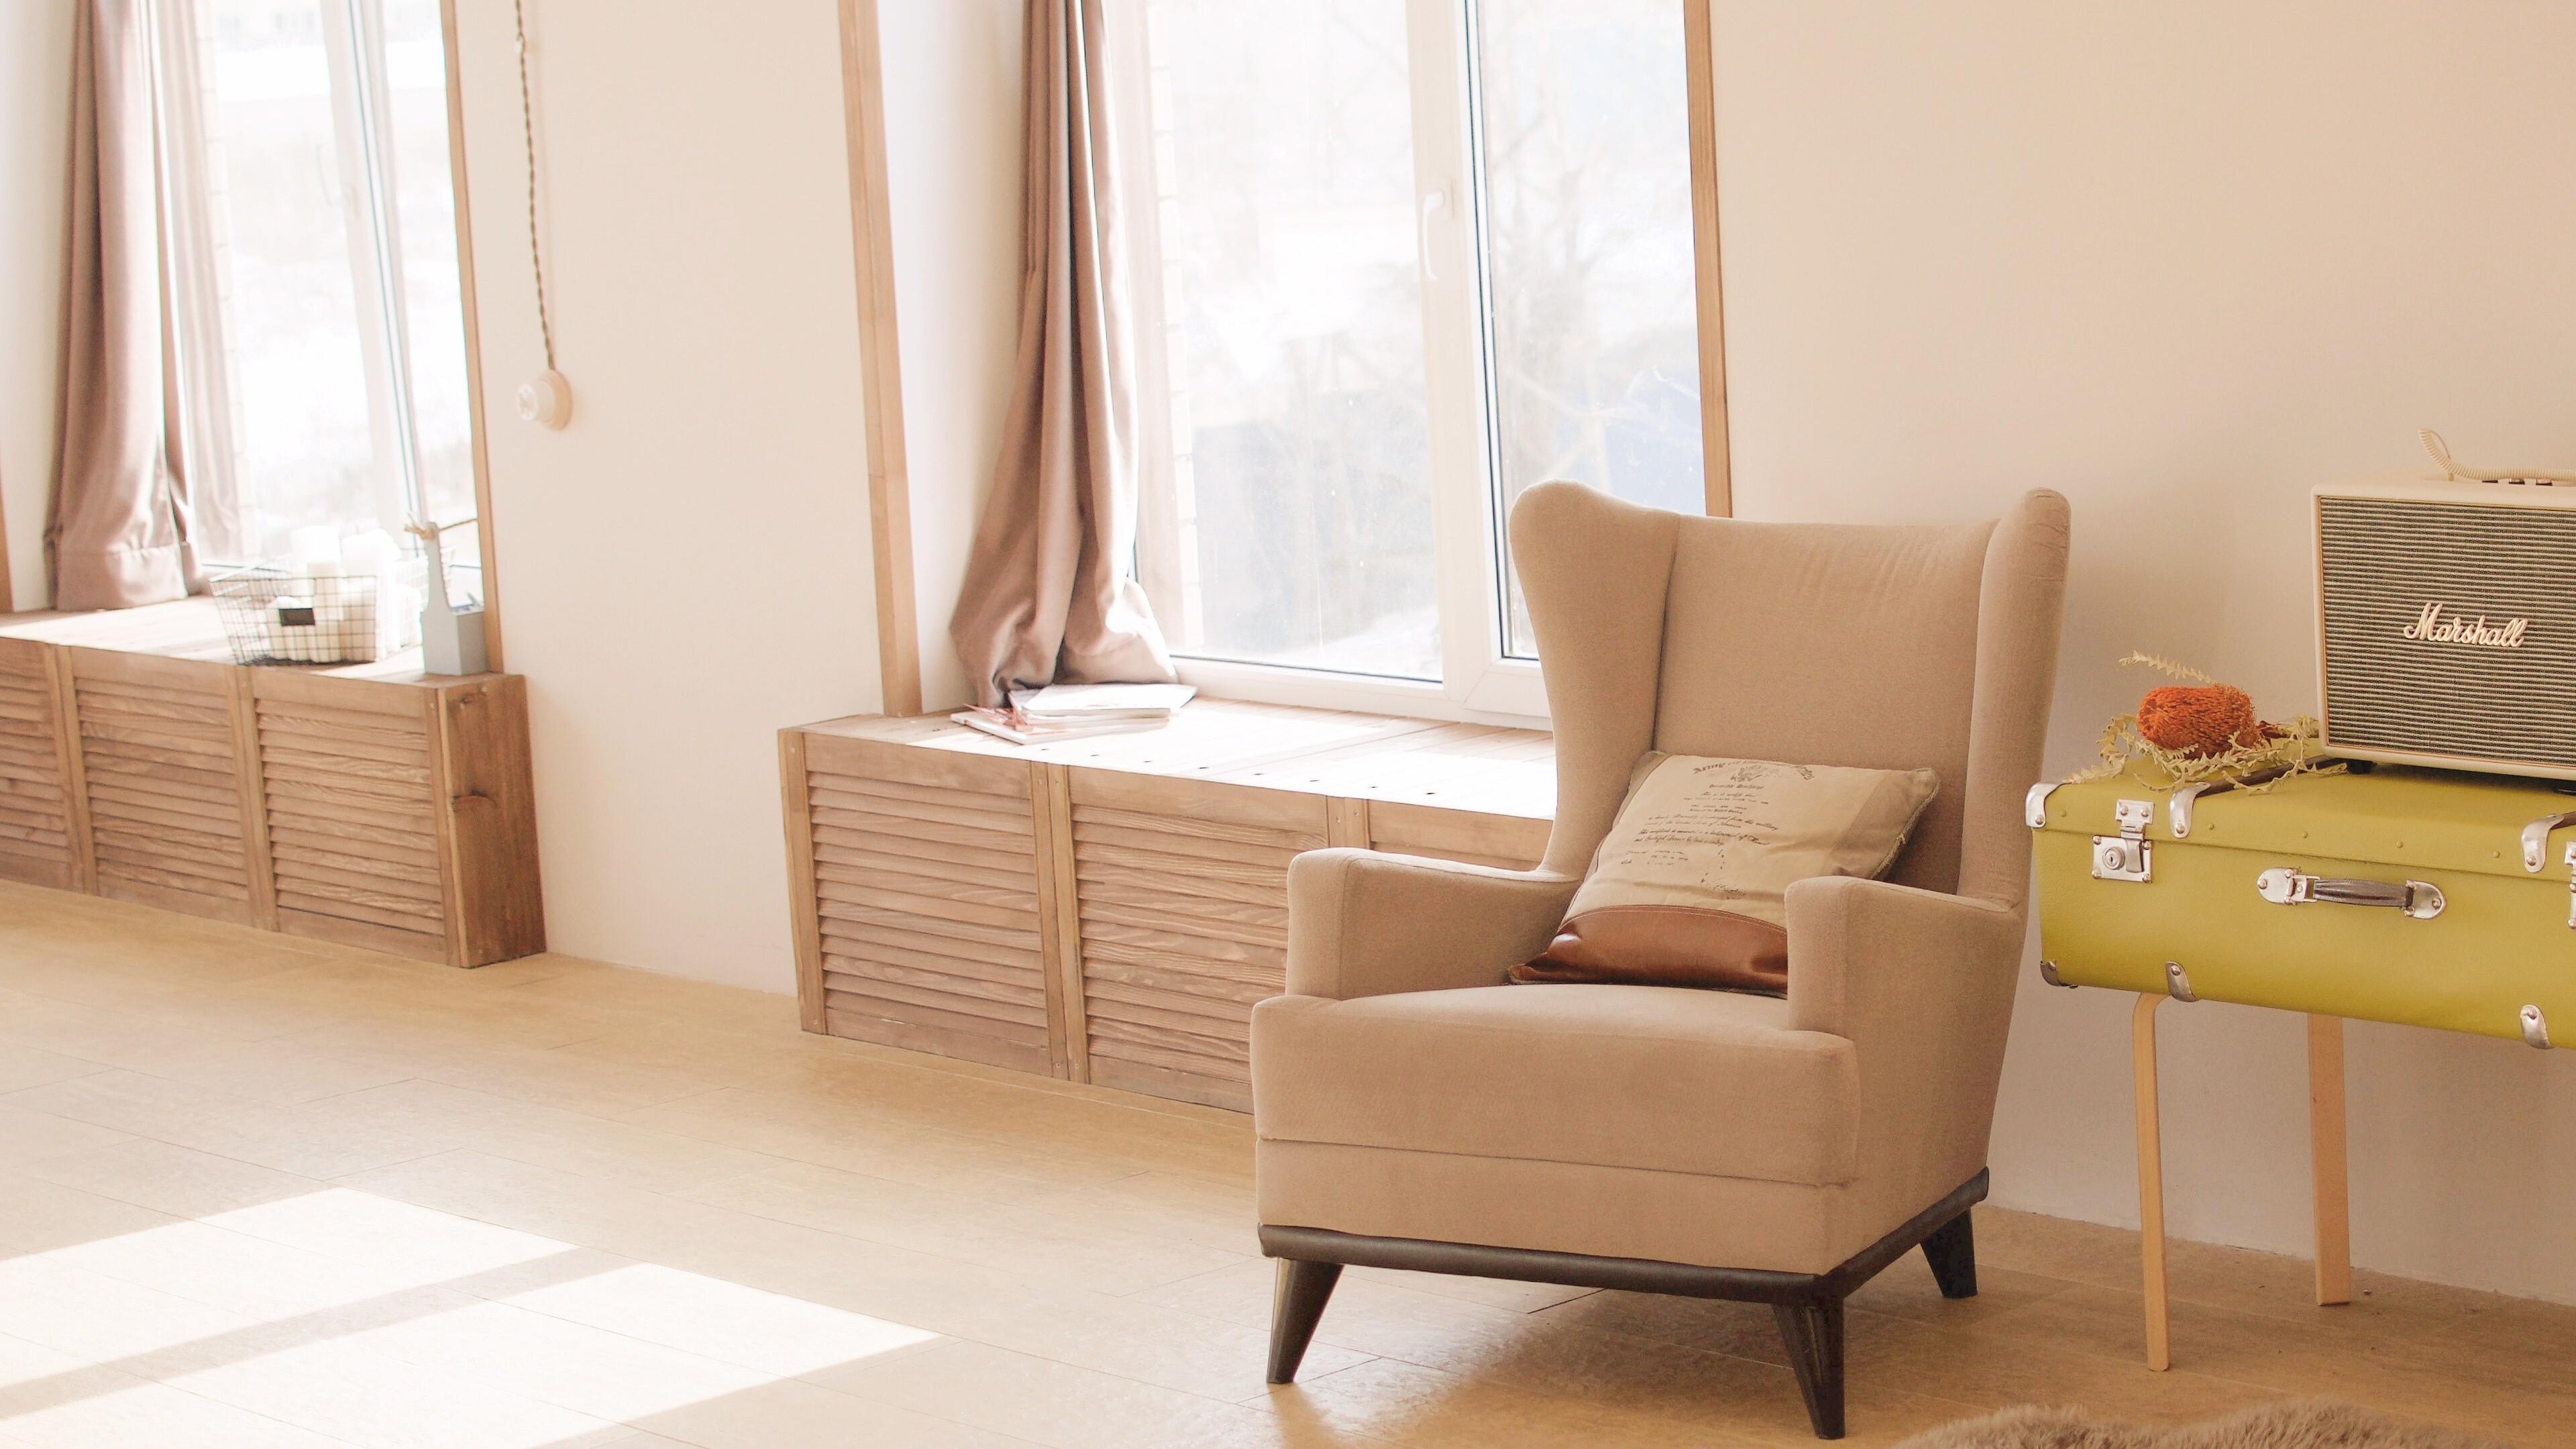 Beautiful Chair in Home 4K Wallpaper | HD Wallpapers